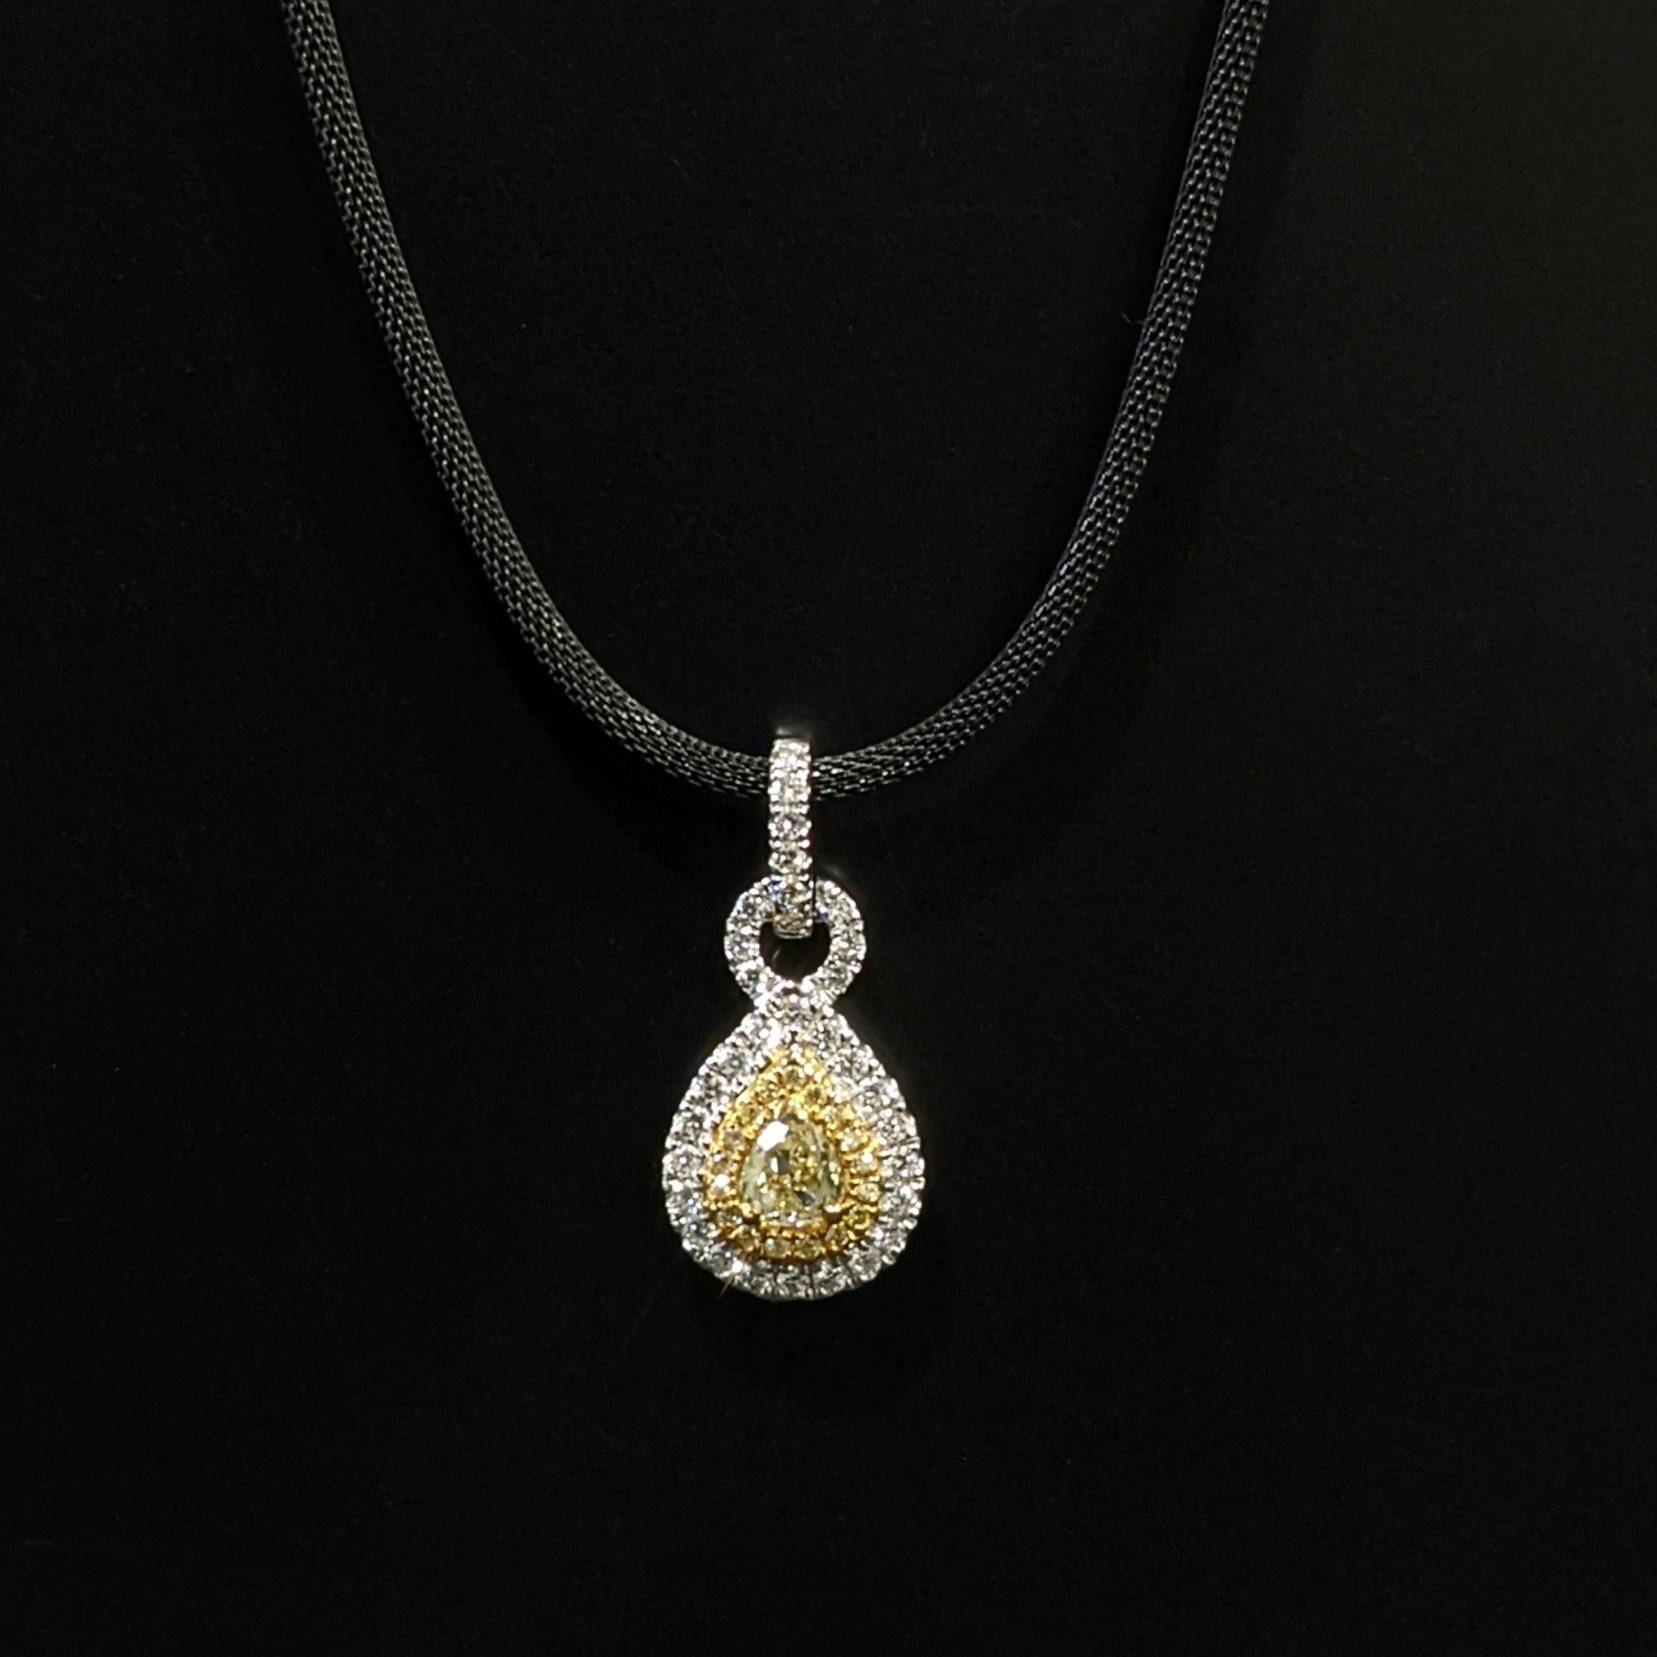 yellow diamond pendant and chain